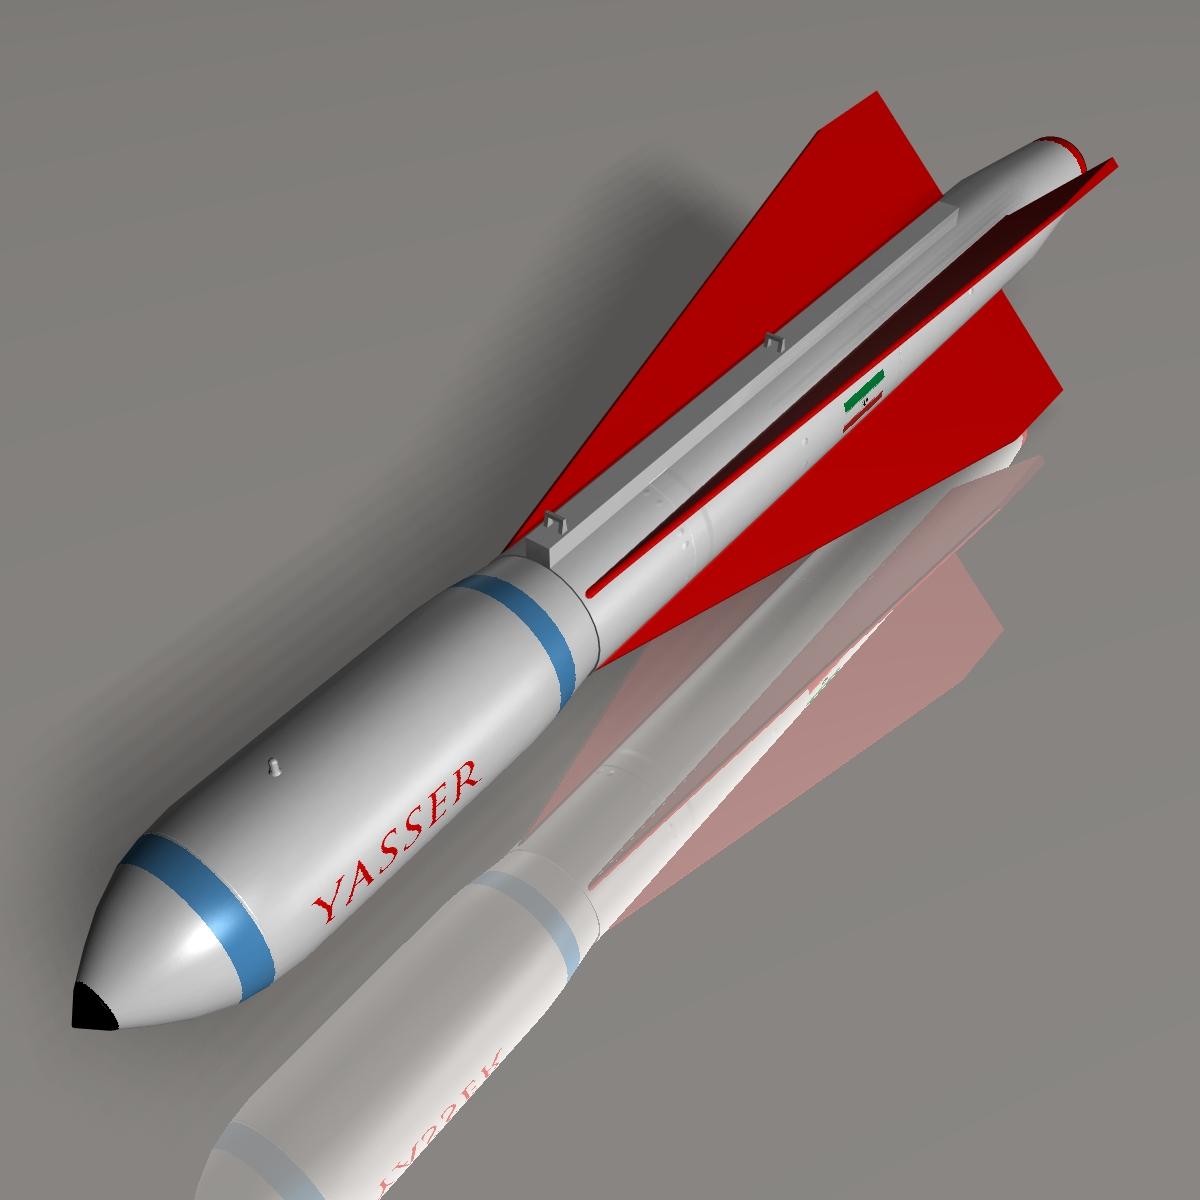 iran yasser asm raketi 3d modeli 3ds dxf cob x obj 150567